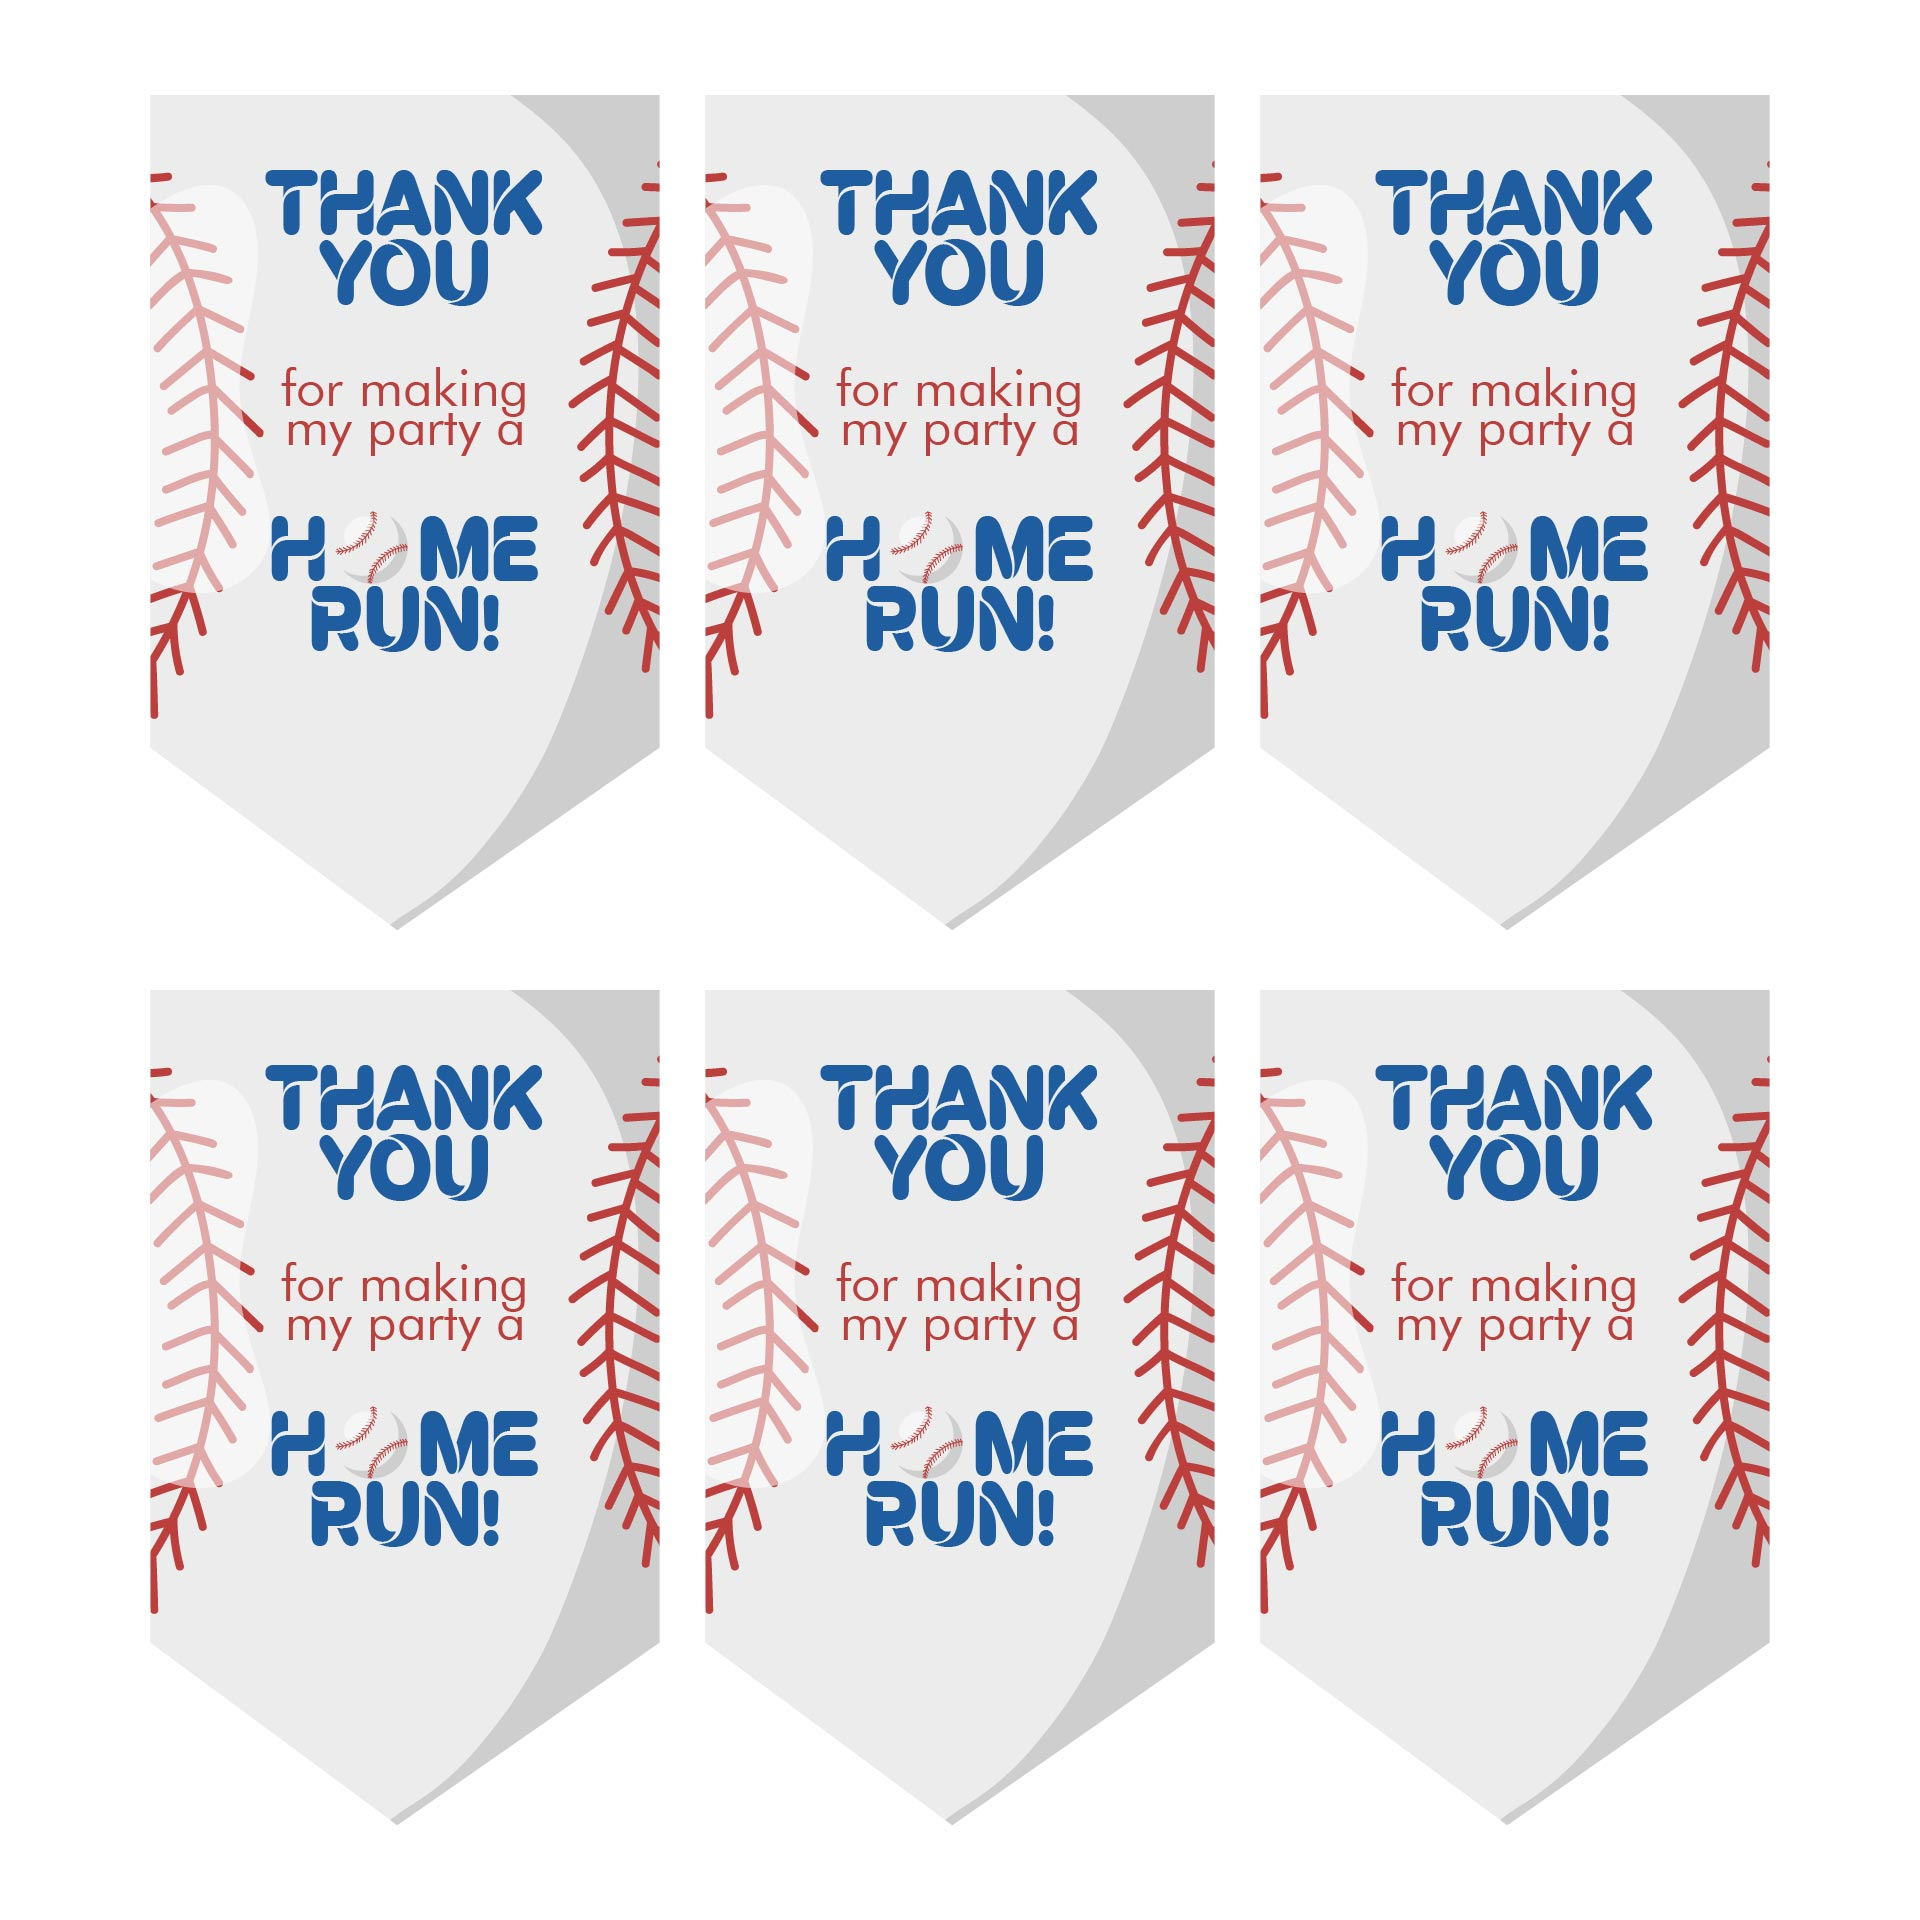 Braves Baseball Bat Bag Tags Printables